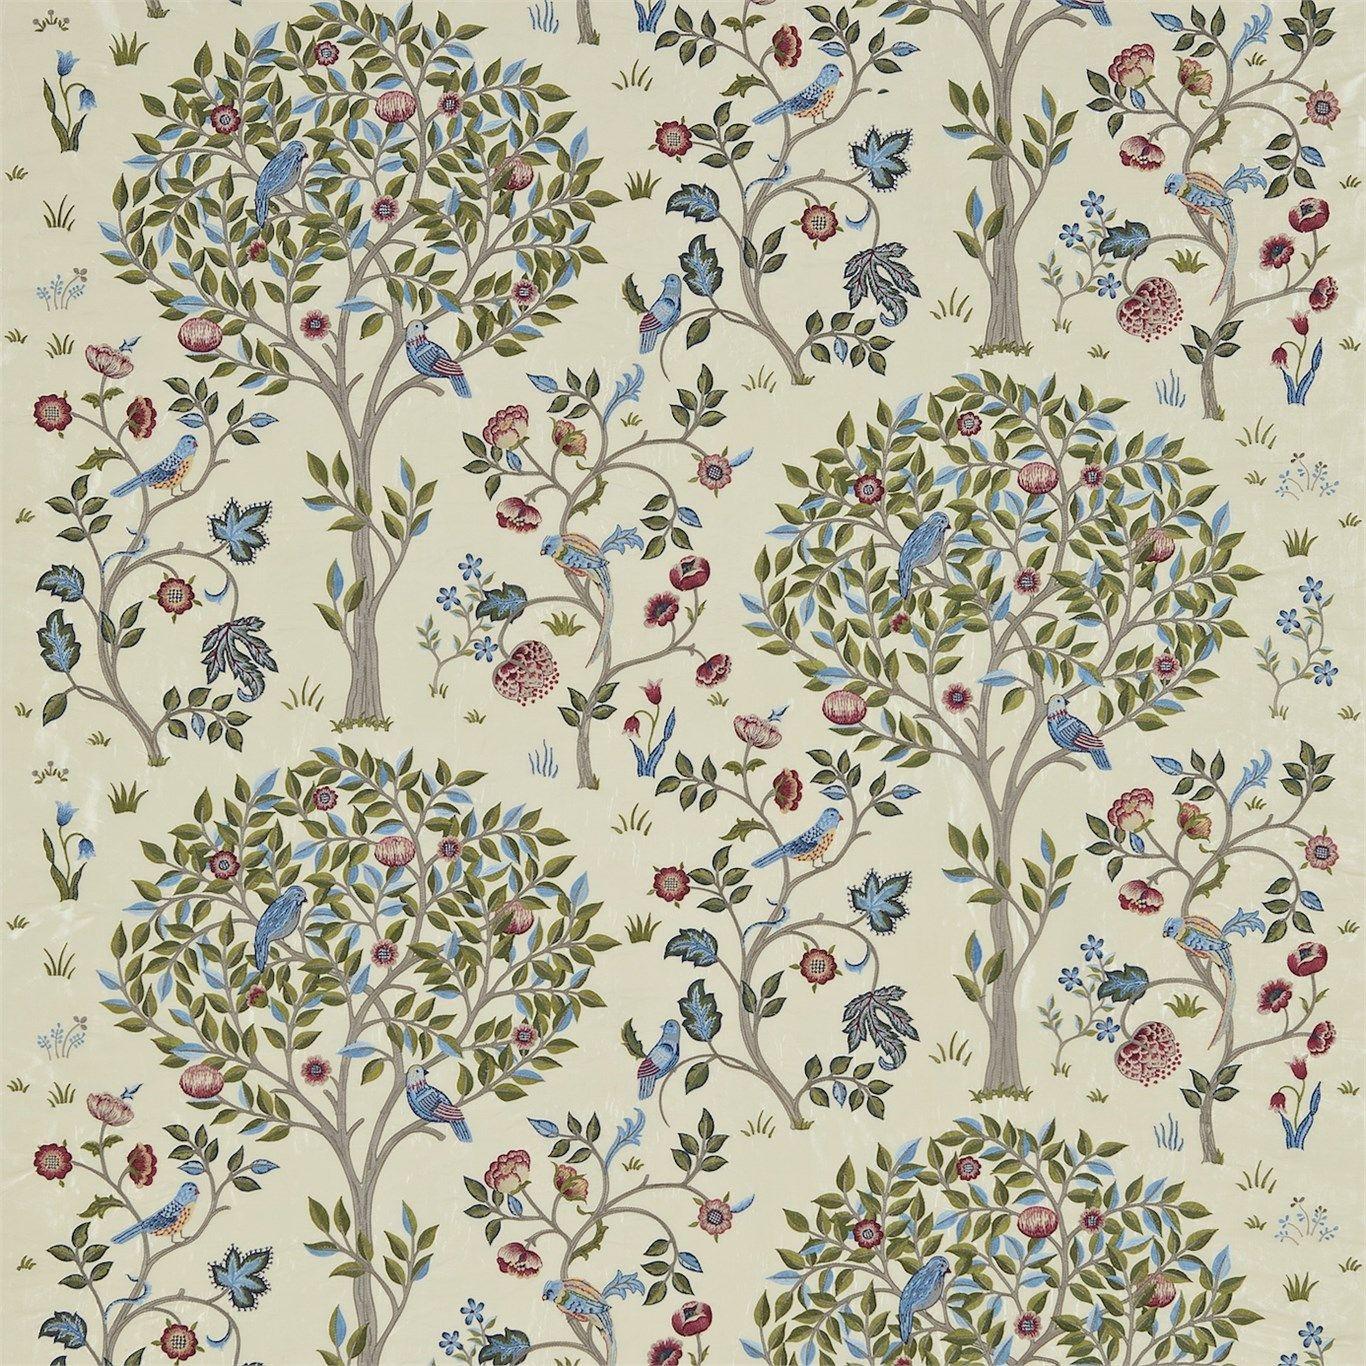 Fabric tree pattern - I Arts And Crafts I Fabrics And Wallpaper Designs By William Morris Company Kelmscott Tree